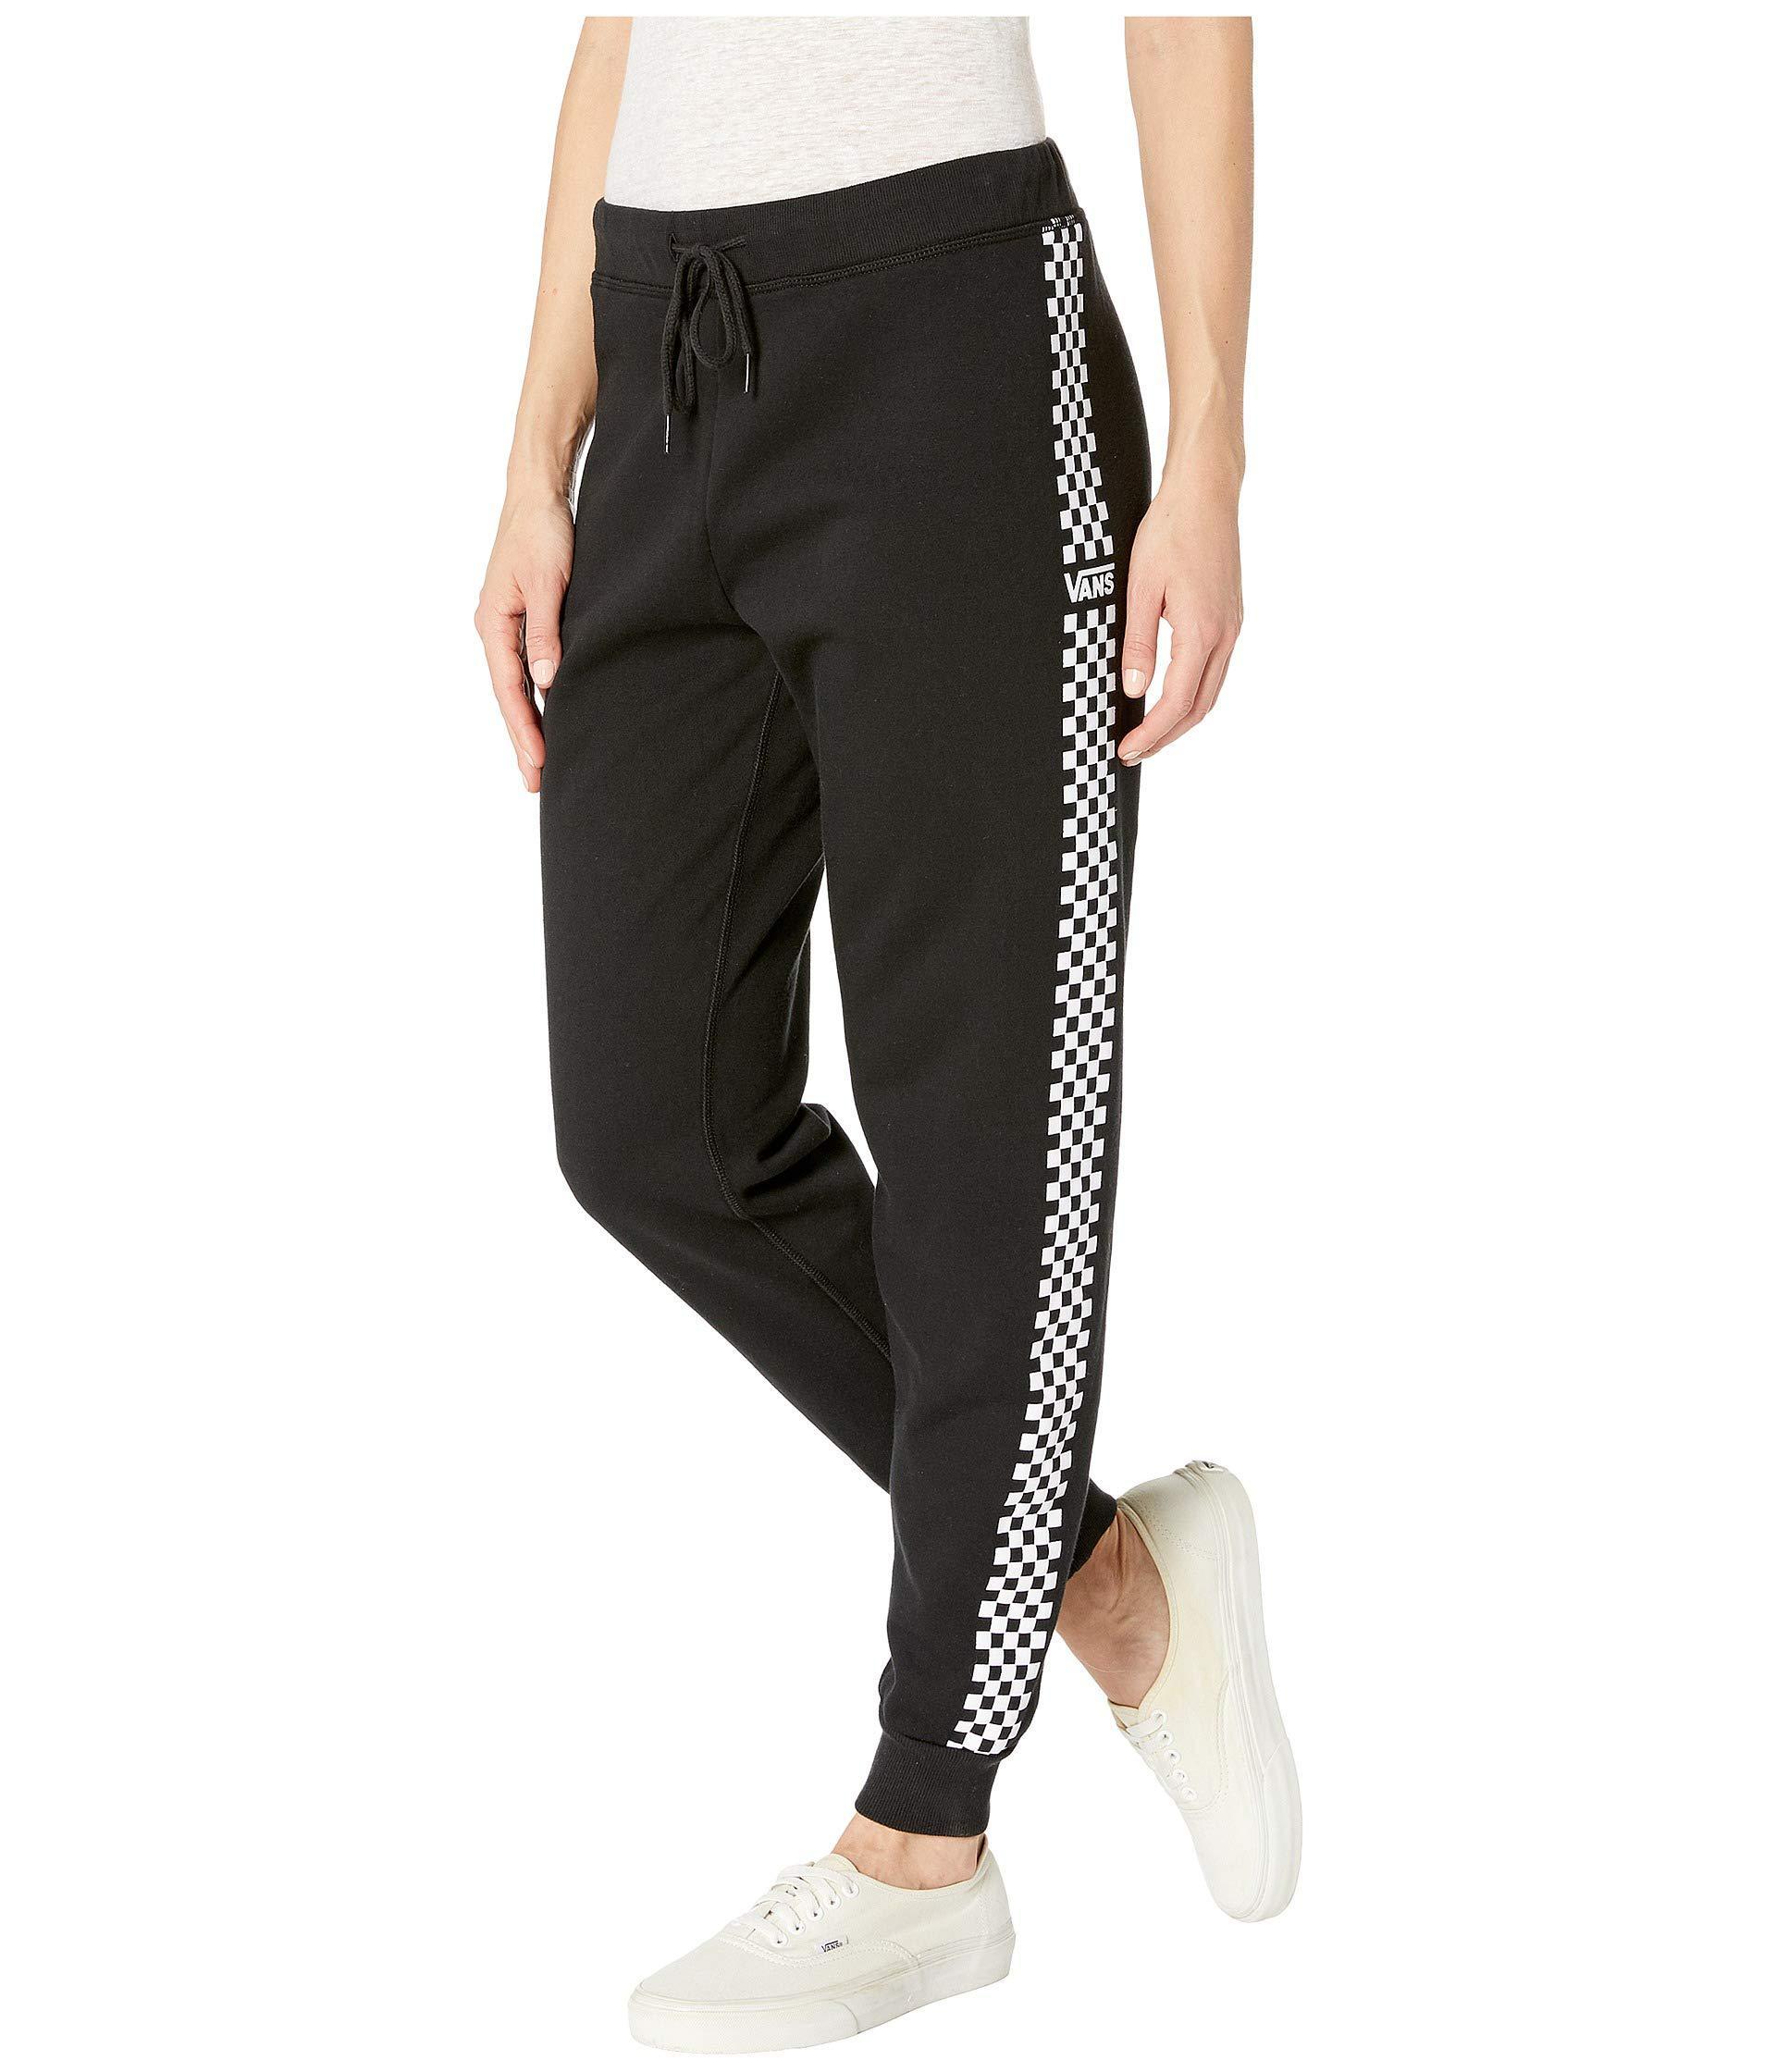 ef17909ab6fb Lyst - Vans Funday Sweatpants (black) Women s Casual Pants in Black